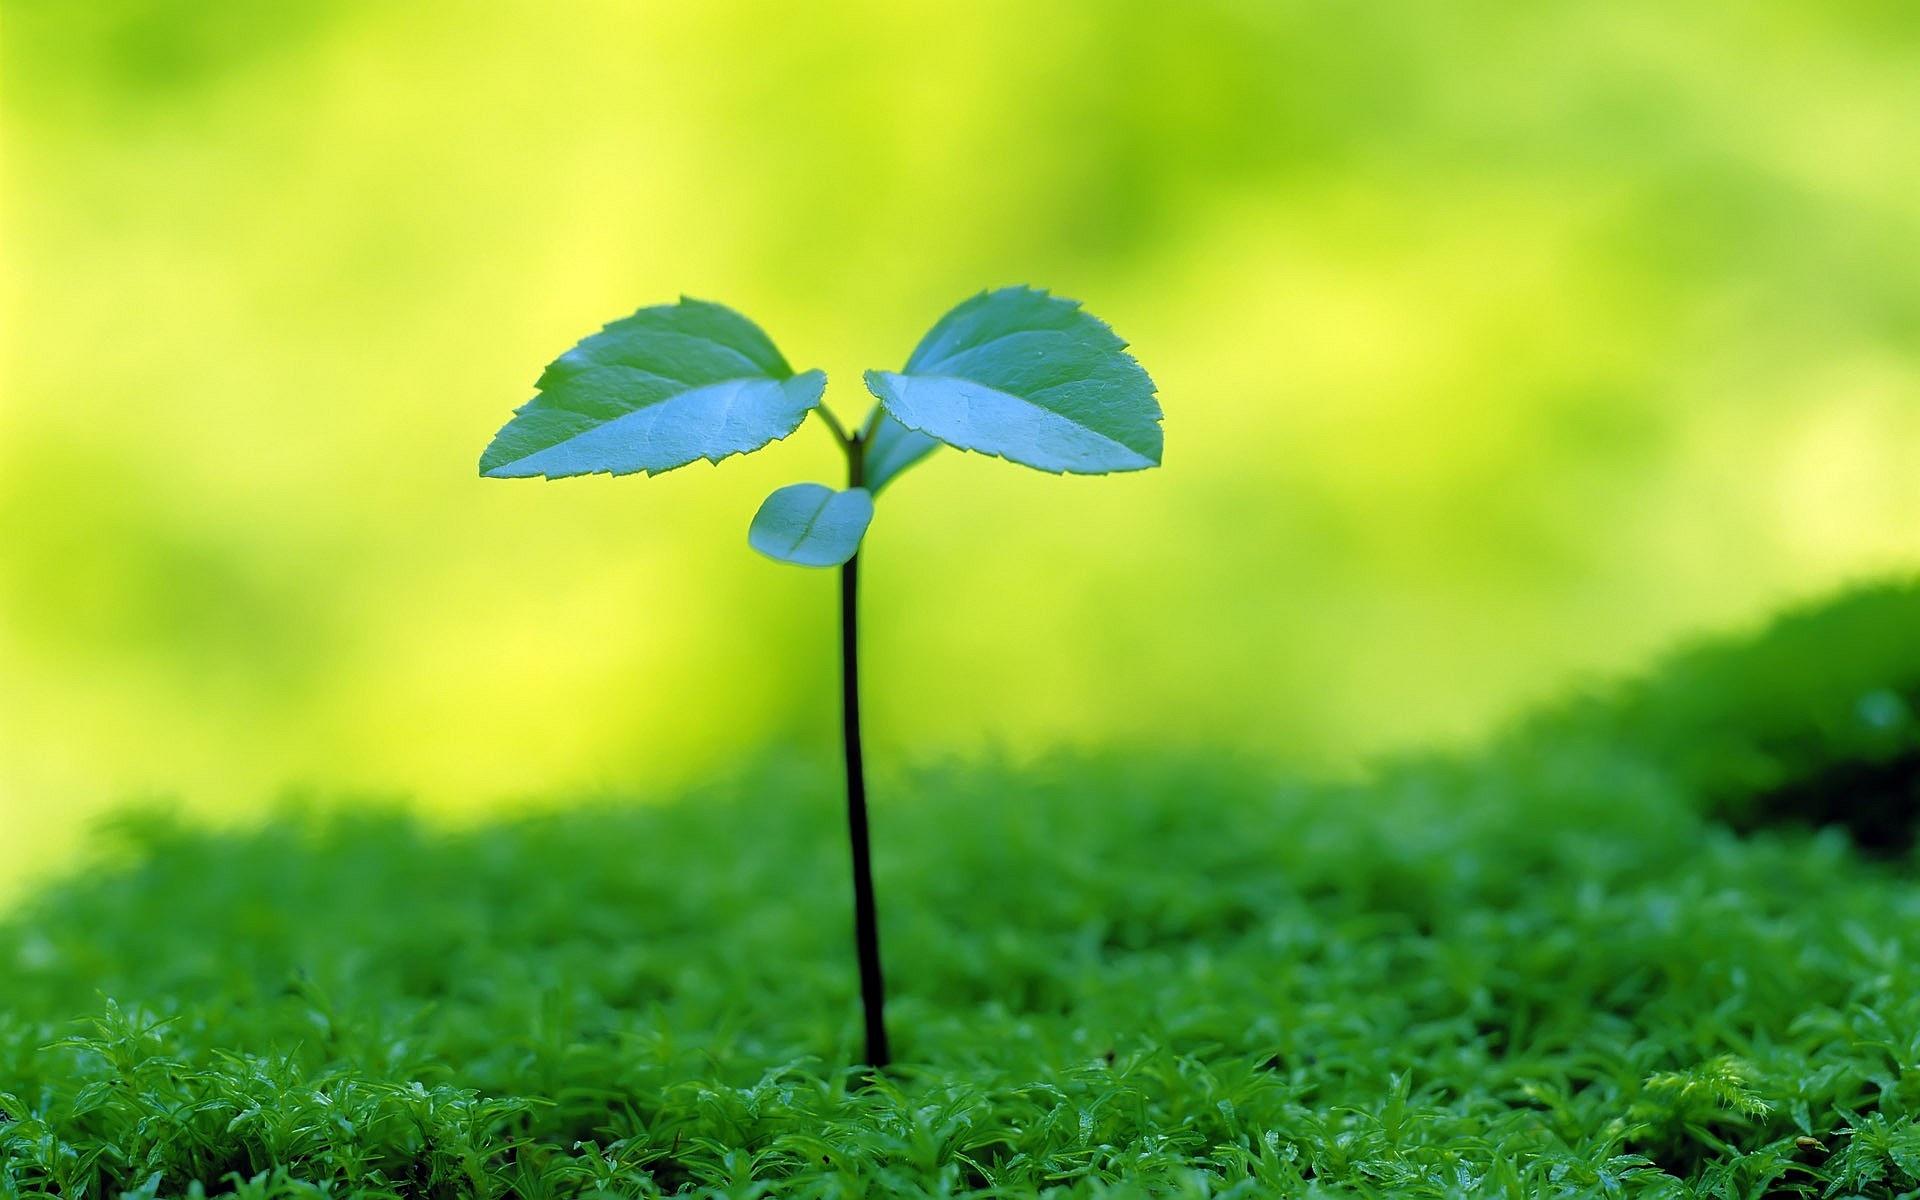 sedum plant hd wallpaper - photo #32